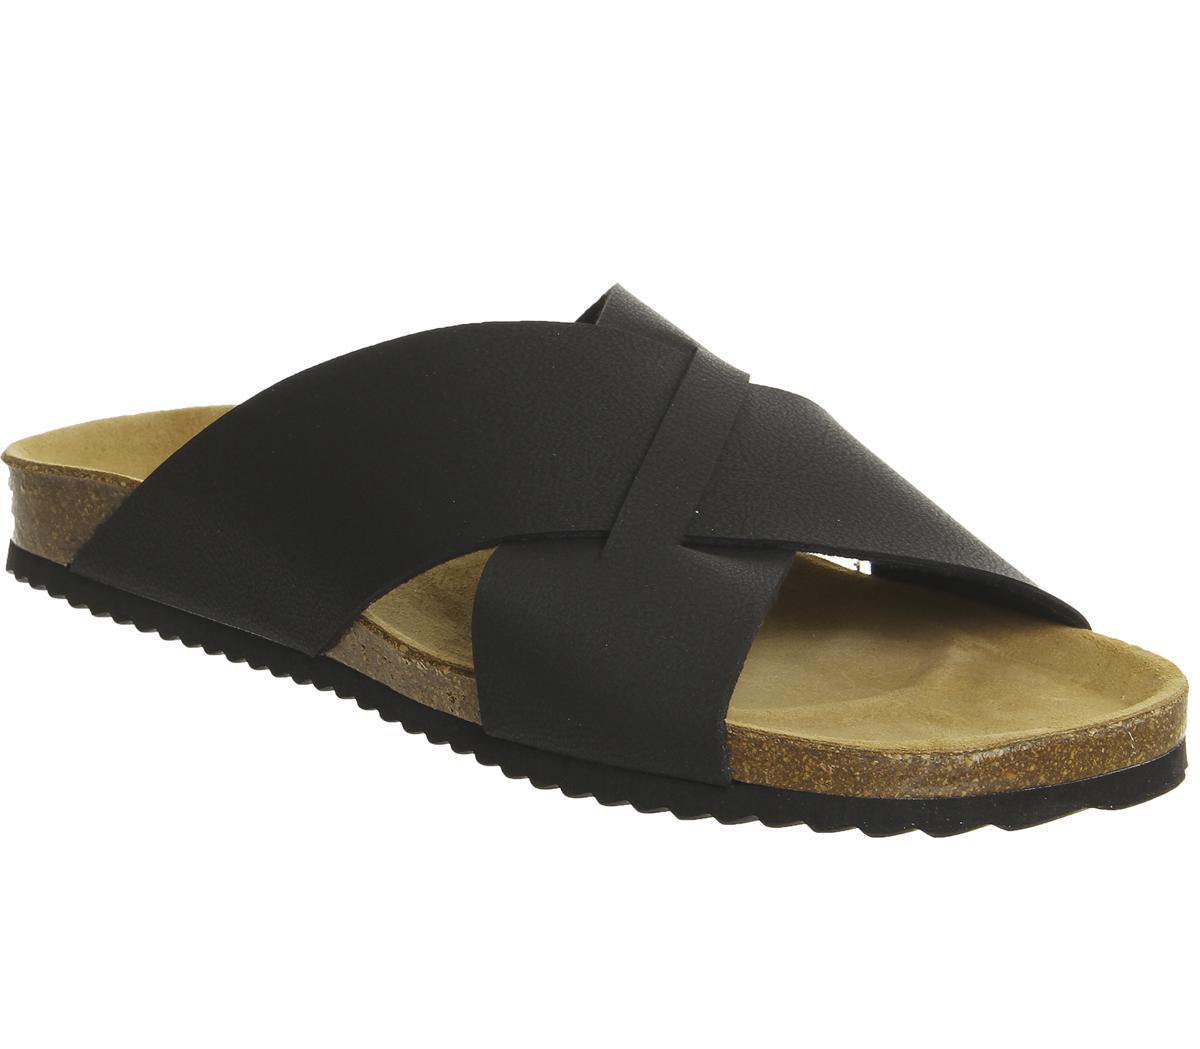 Fiji Cross Strap Sandals